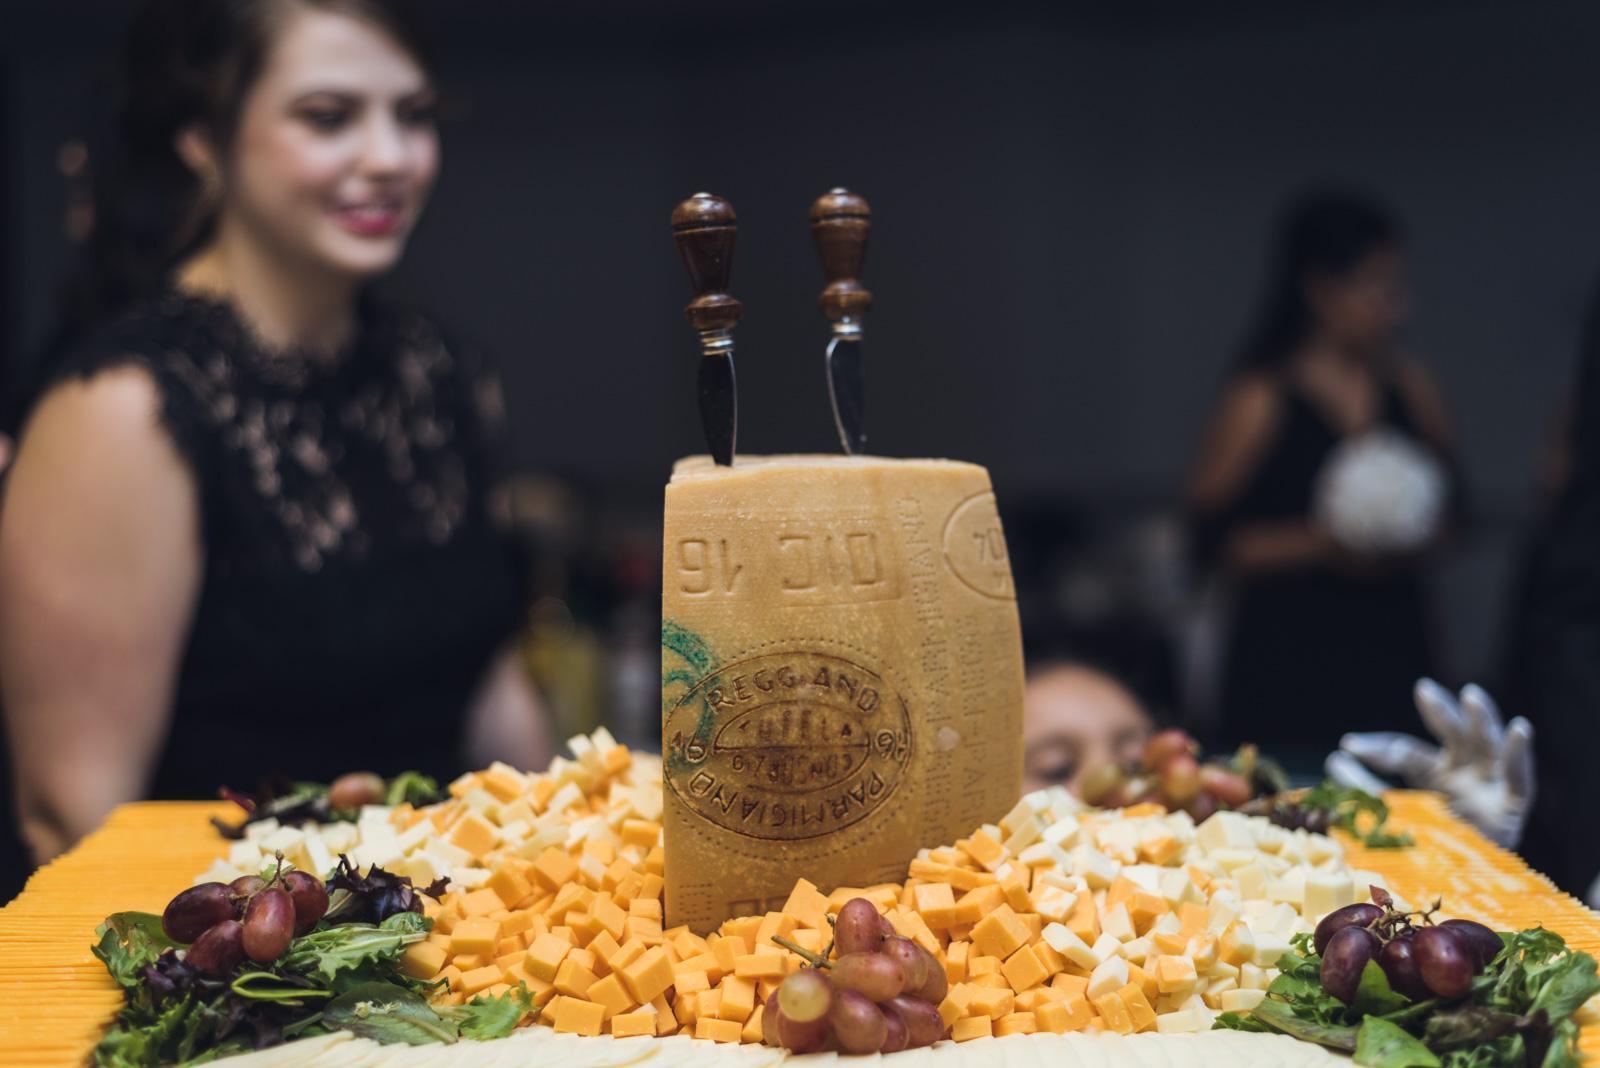 rheana-chris-wedding-blog-201.jpg